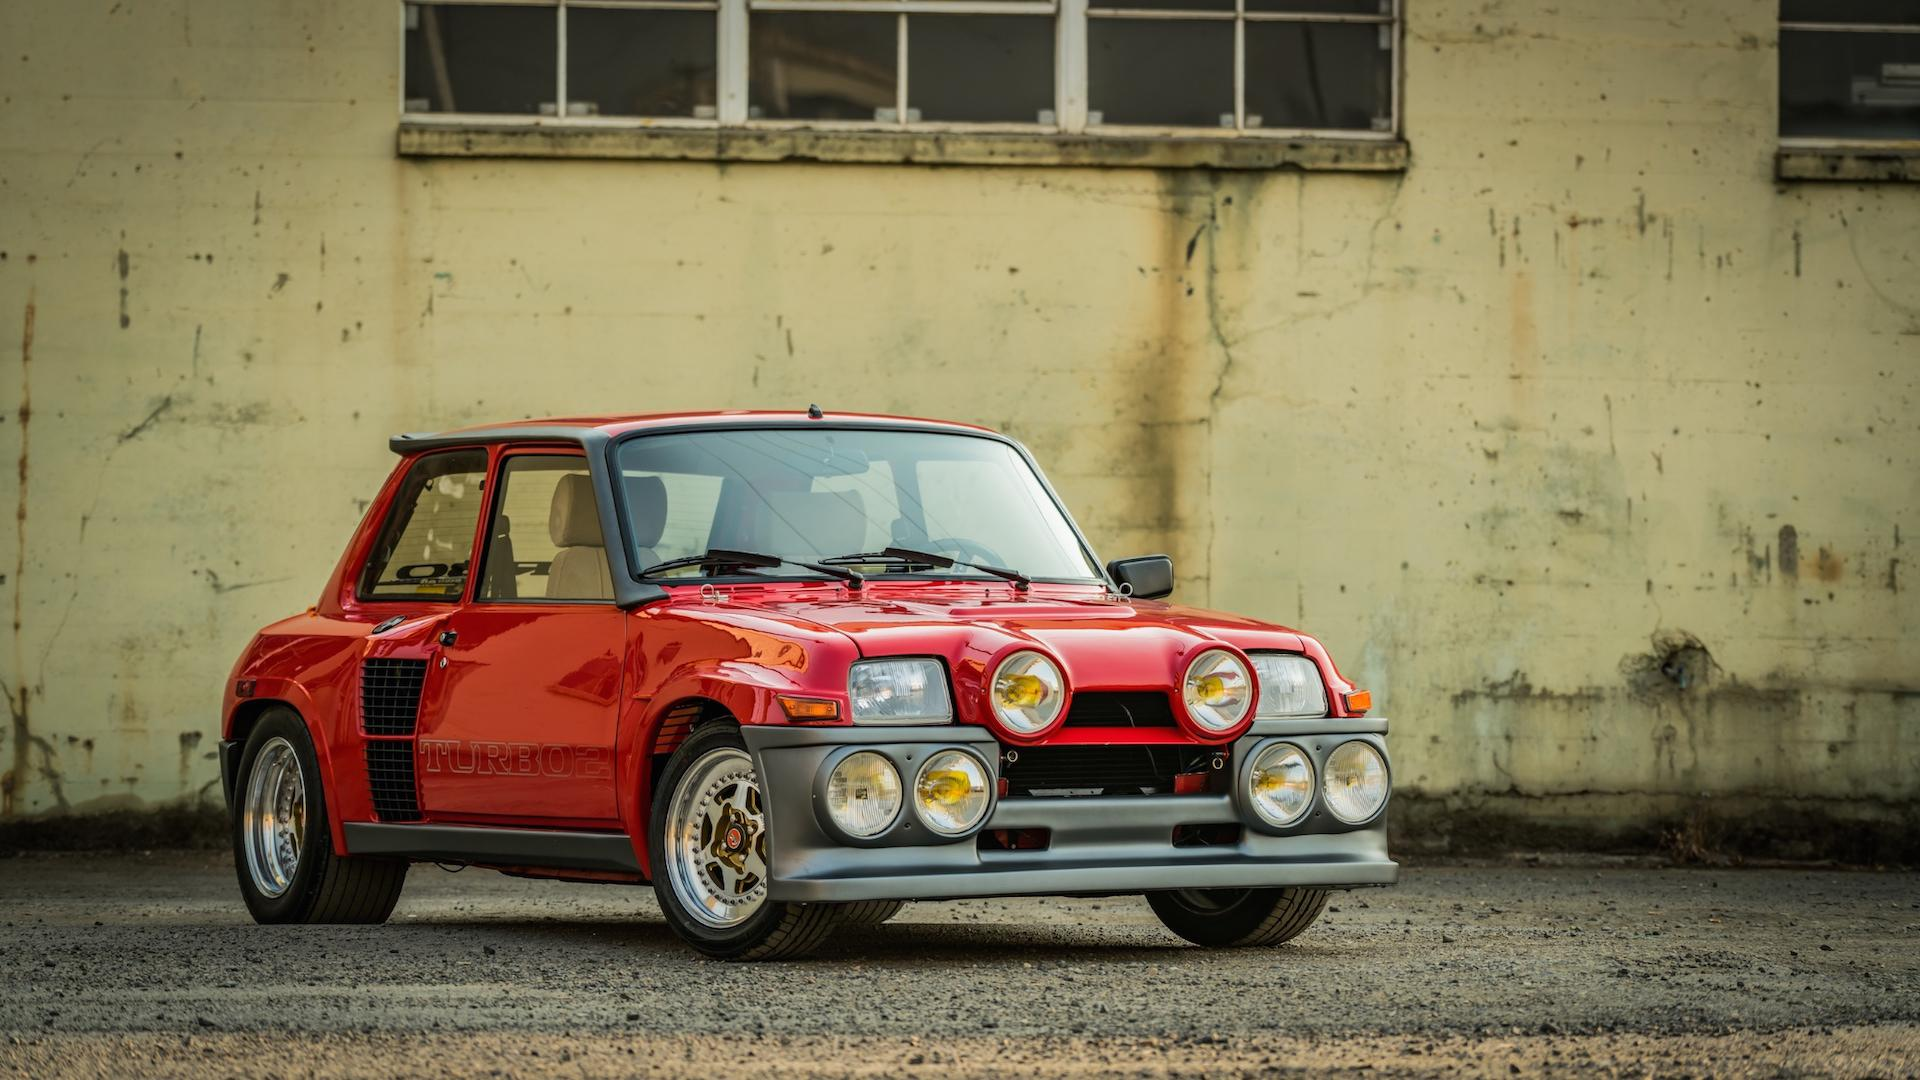 1985 Renault R5 Turbo 2 Evolution 2363562